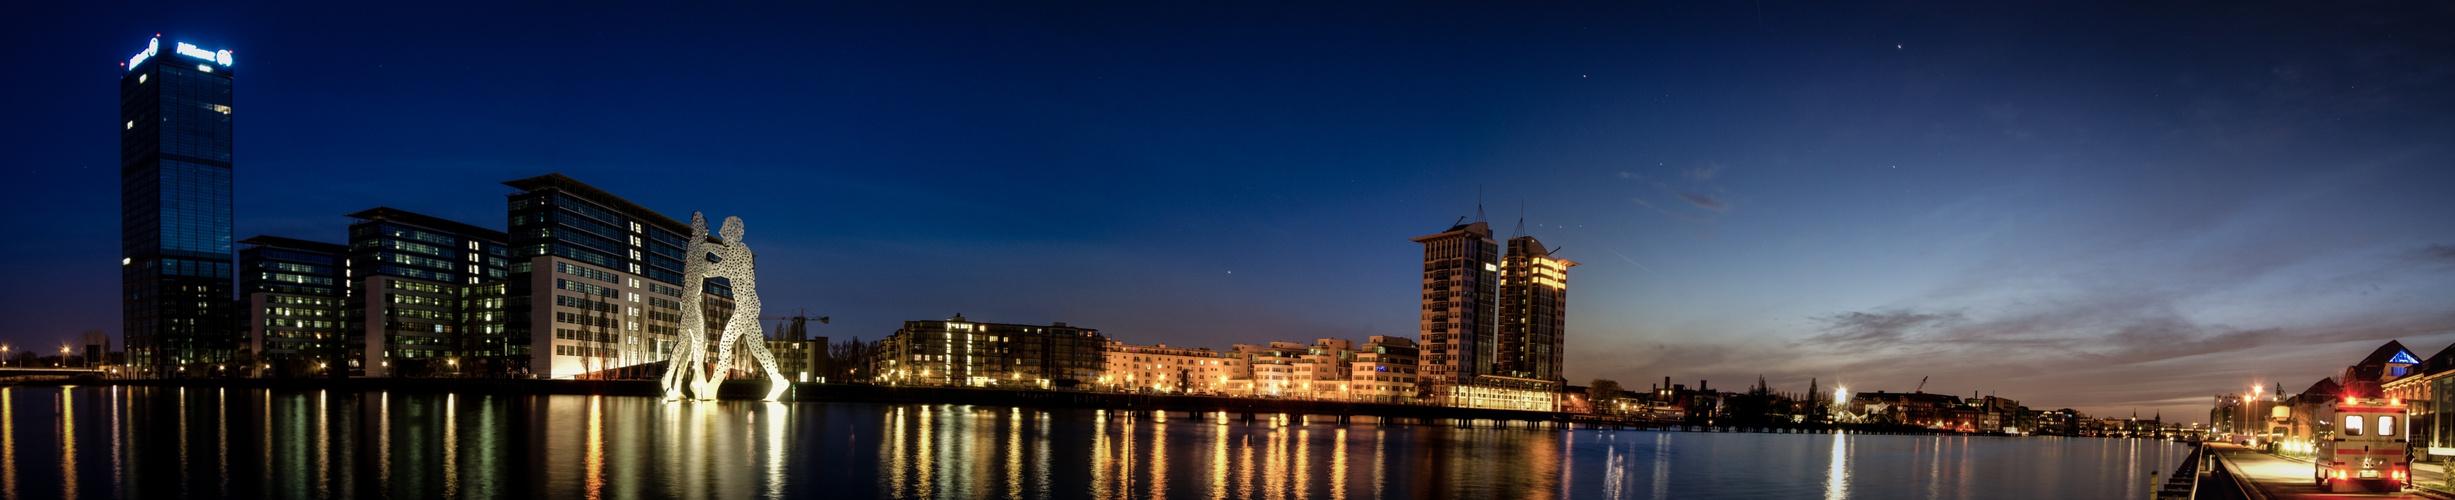 Osthafen Panorama